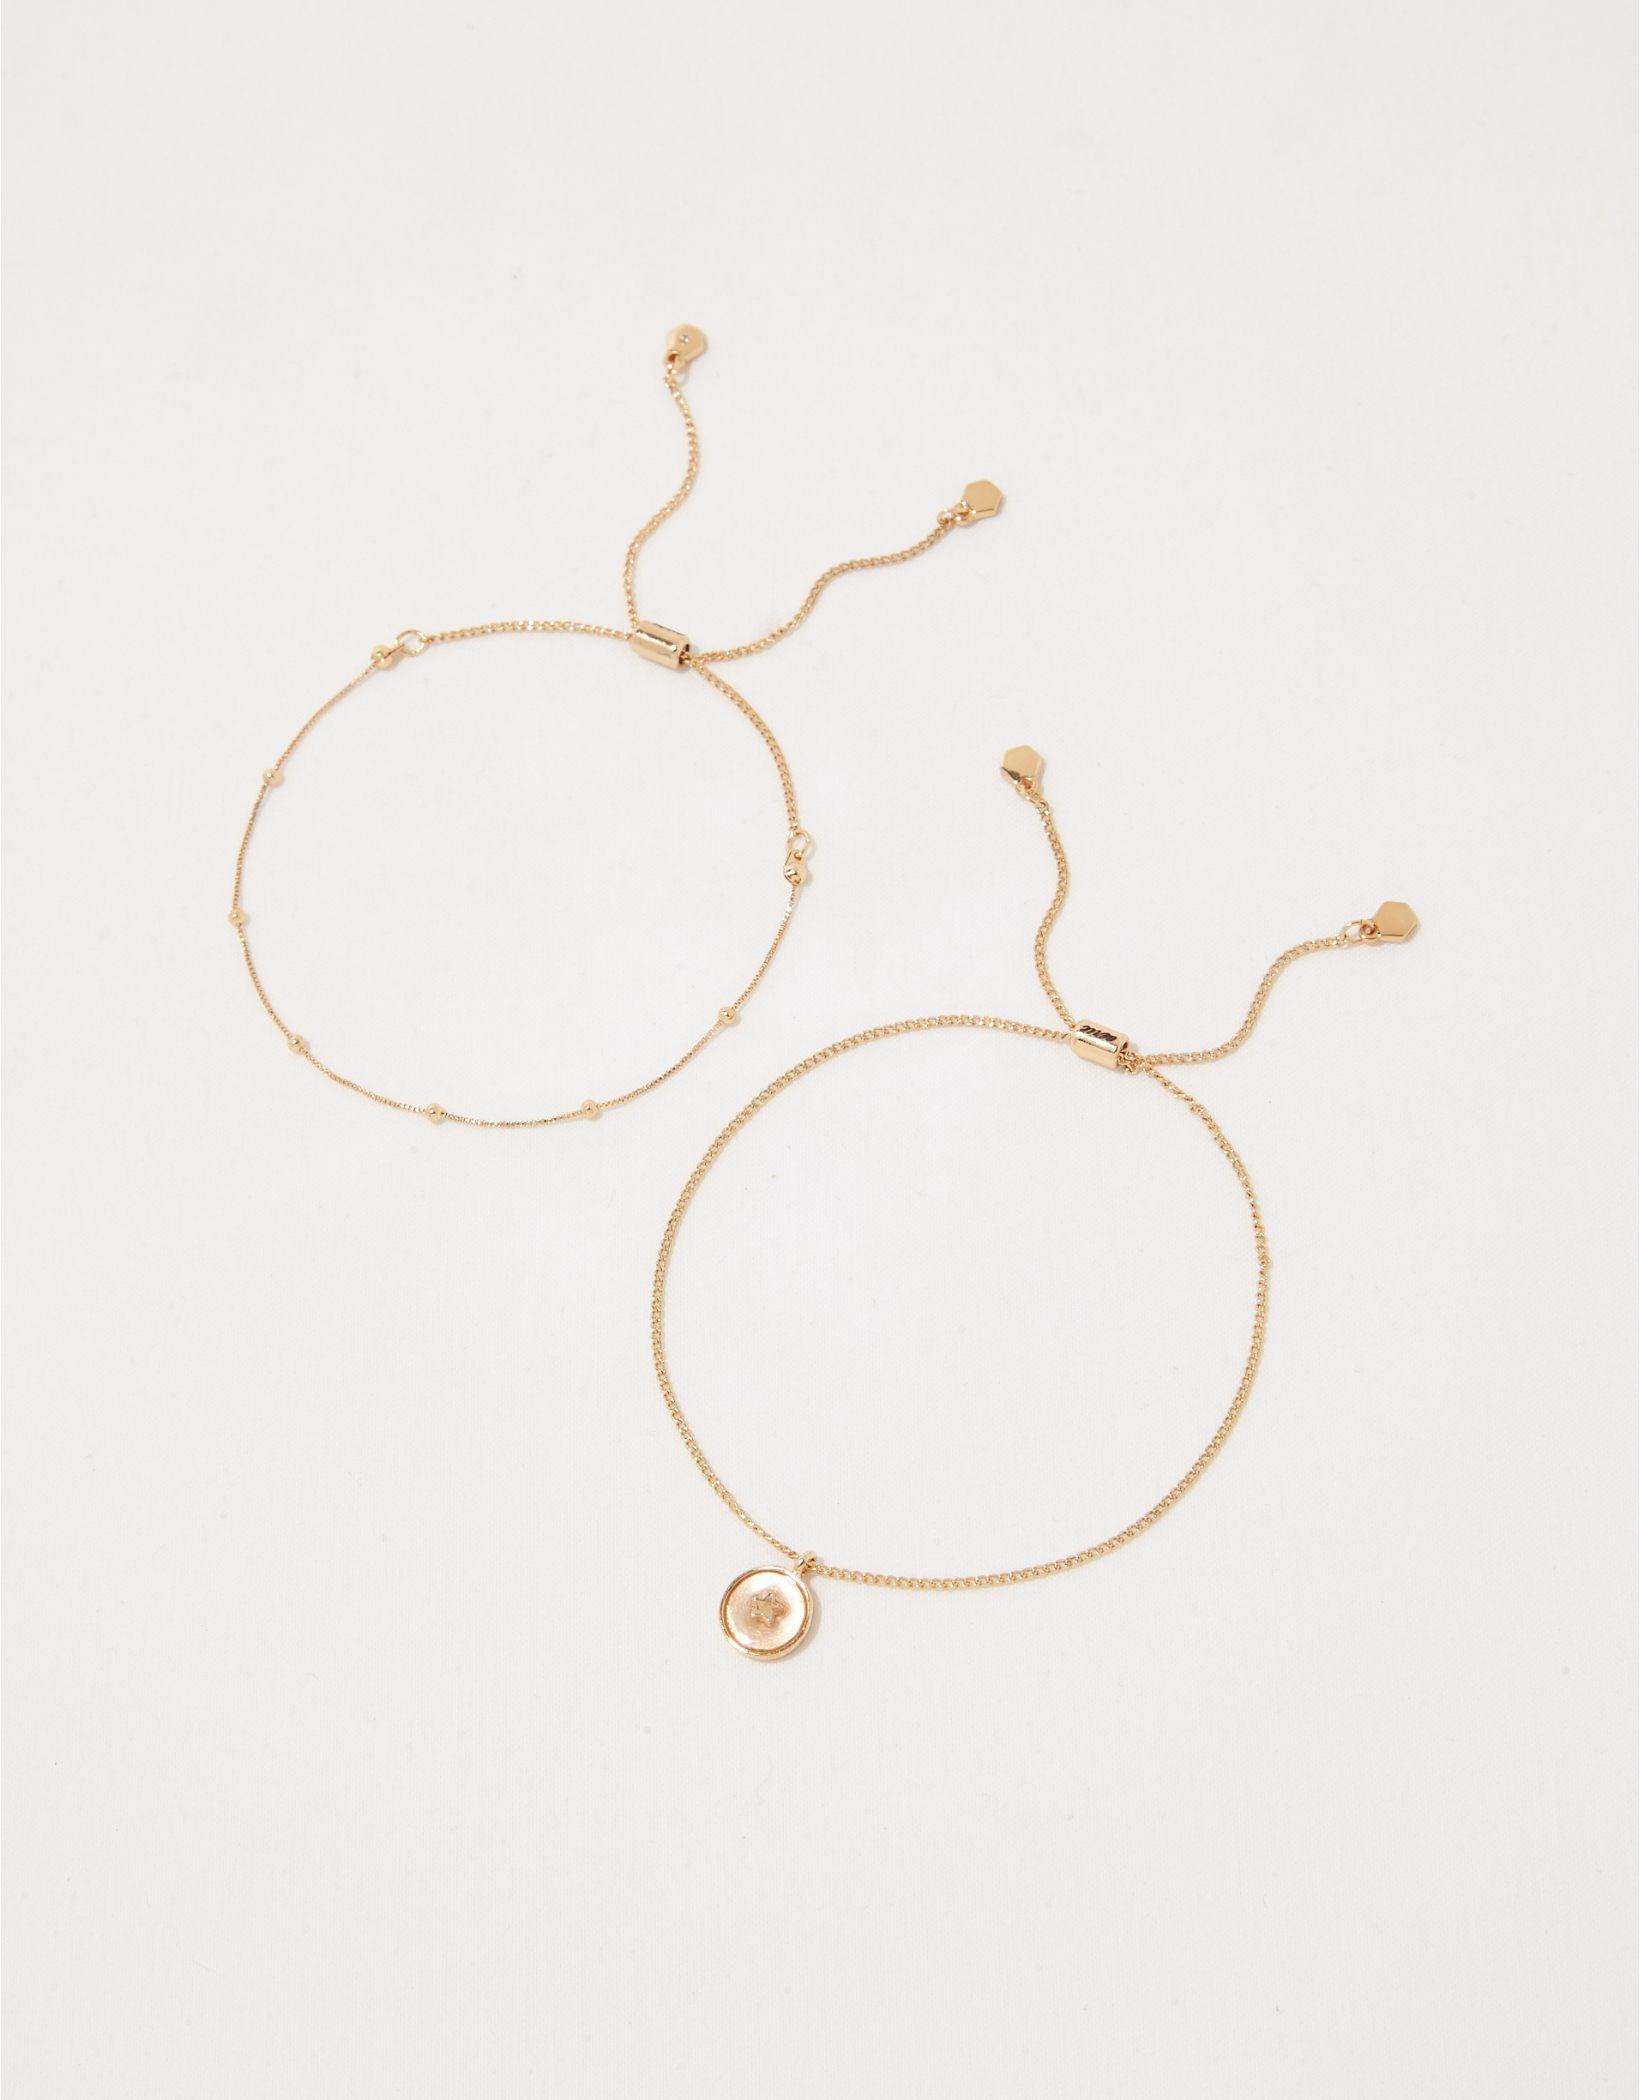 Aerie Stone Inset Bracelets